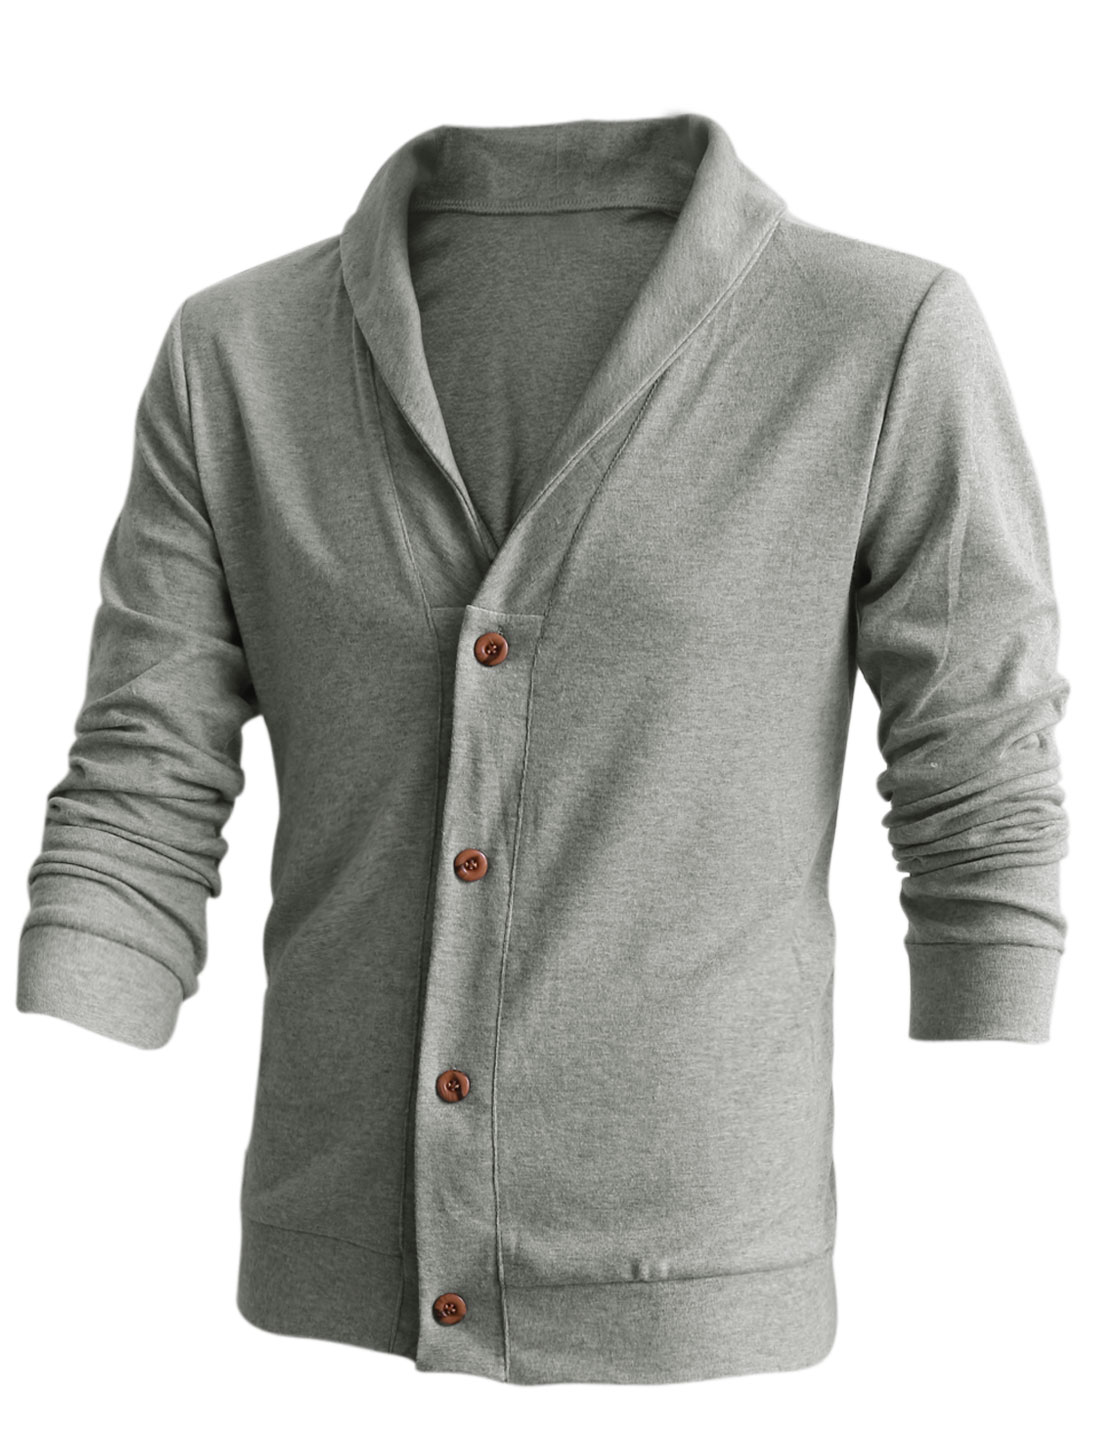 Men Shawl Collar Single Breasted Casual Cardigan Light Gray M